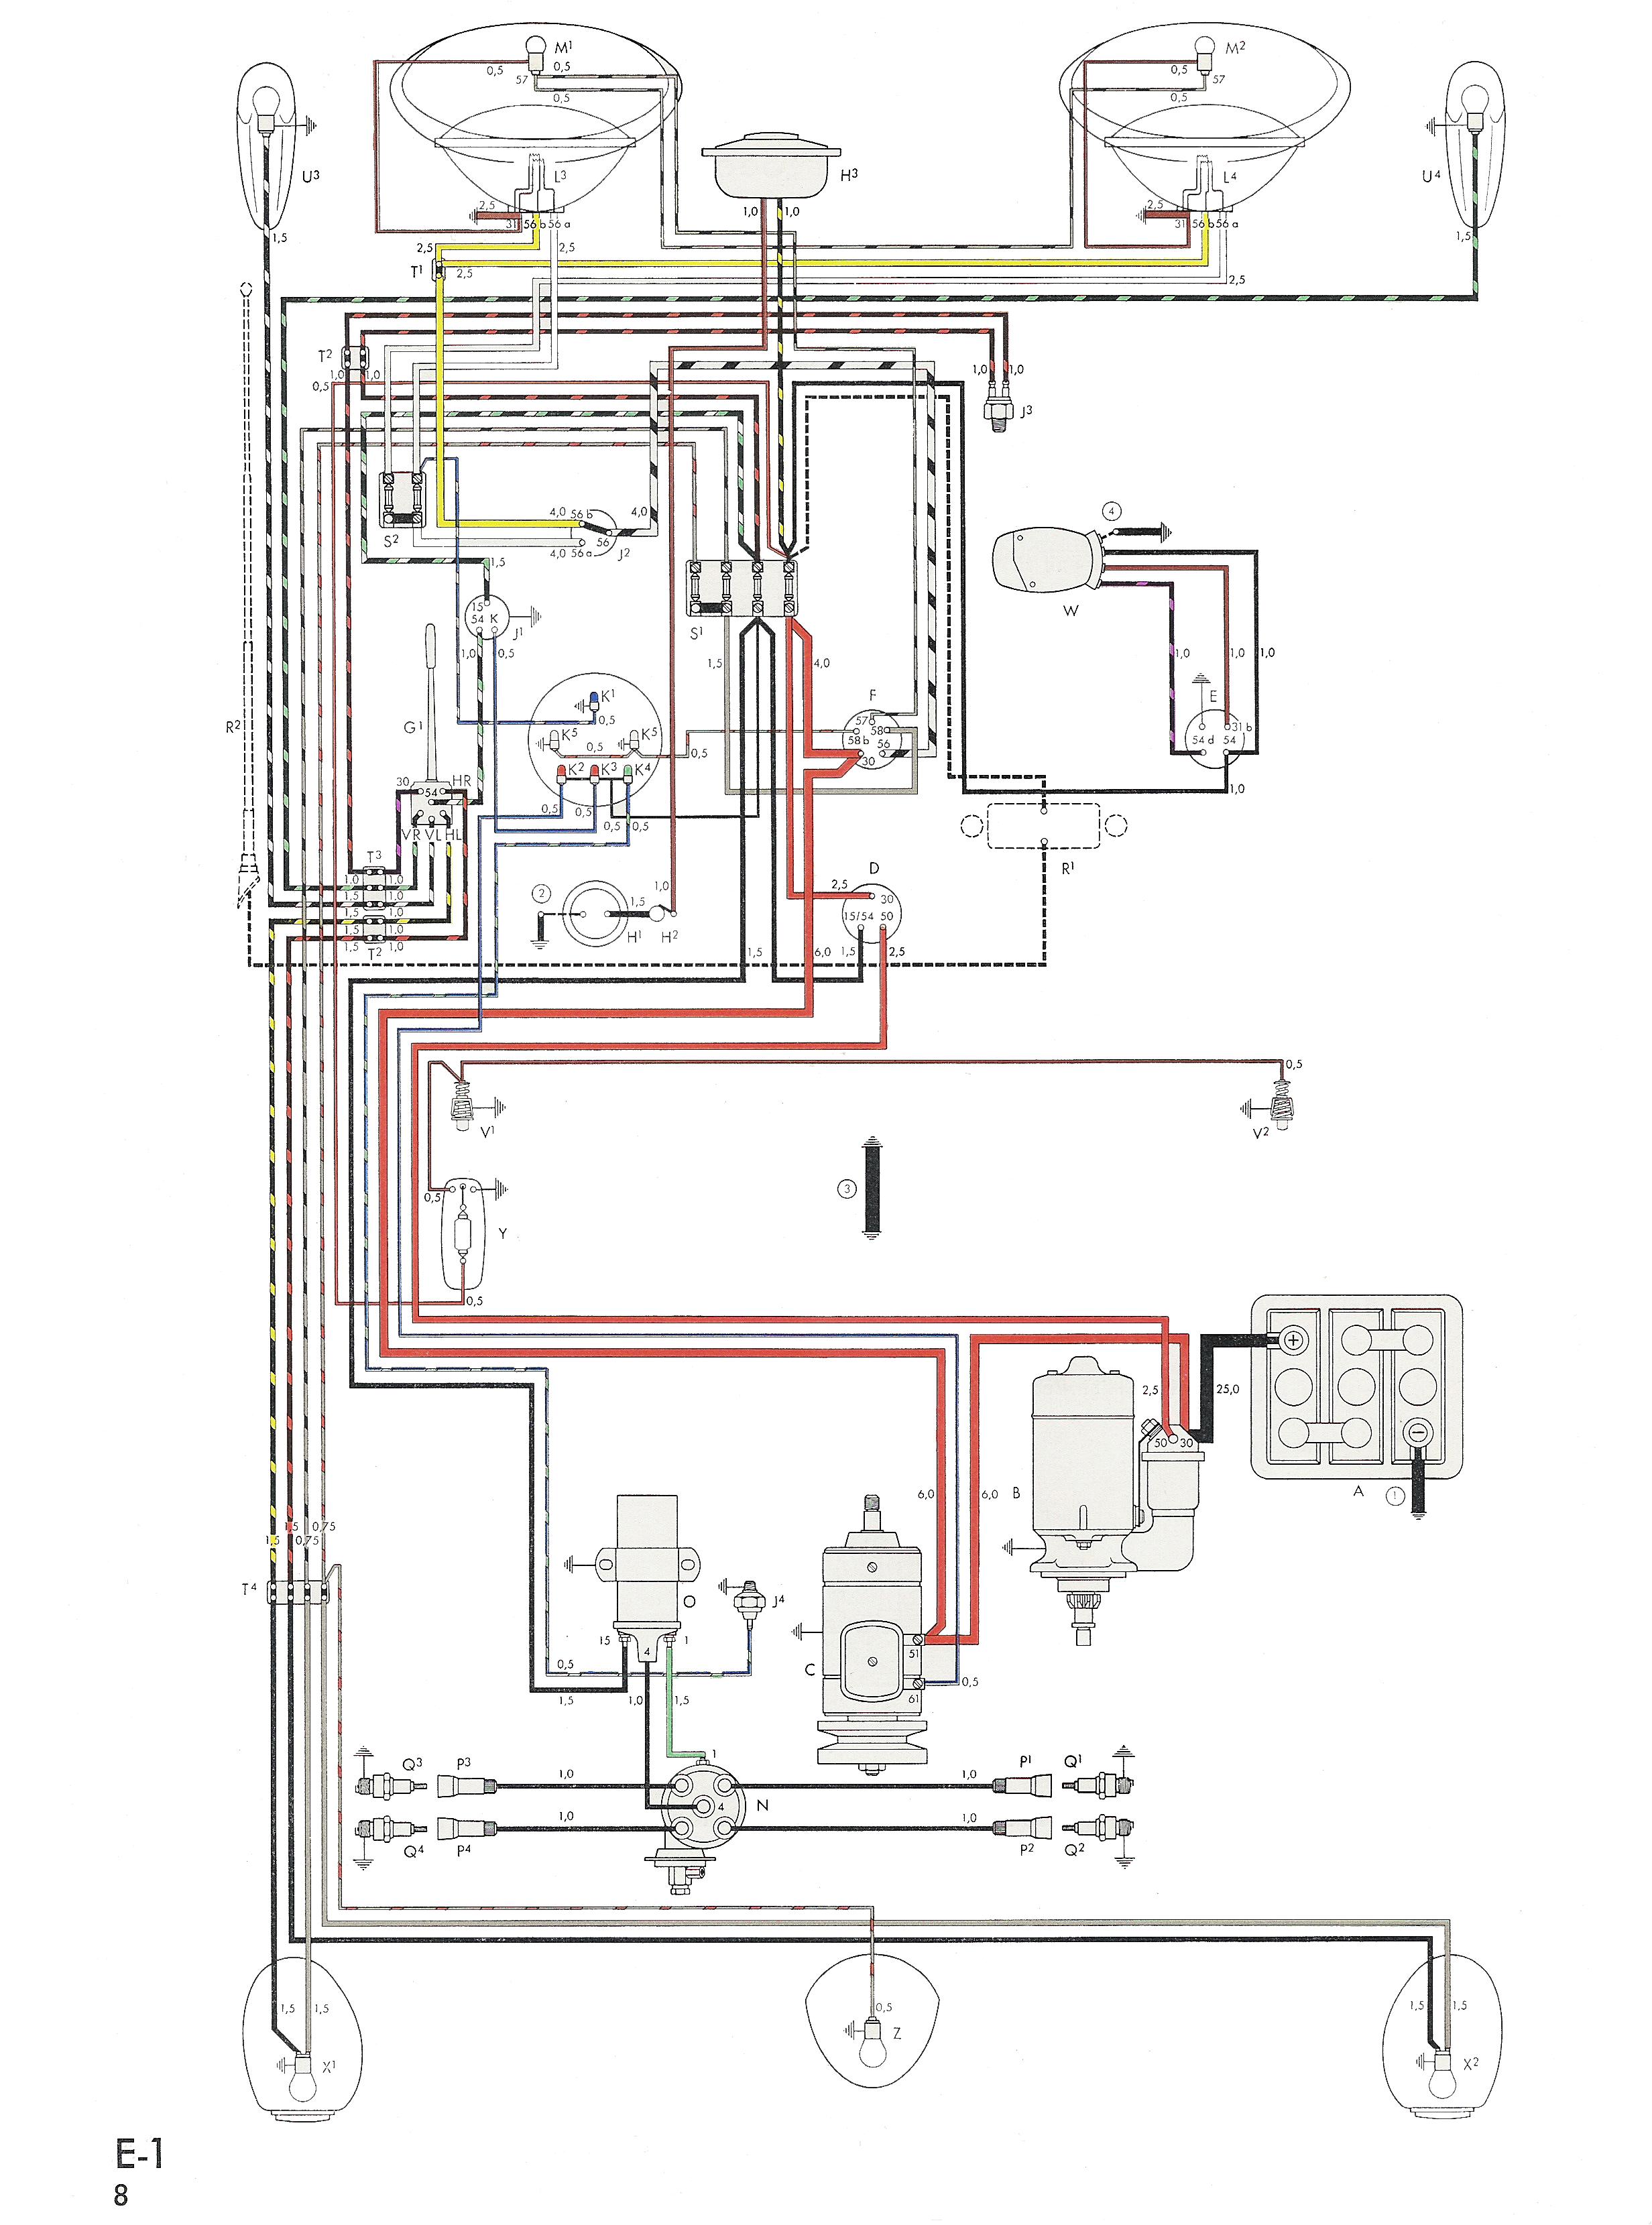 Beetle Wiring Diagram Baja Bug Wiring Diagram Wiring Diagram